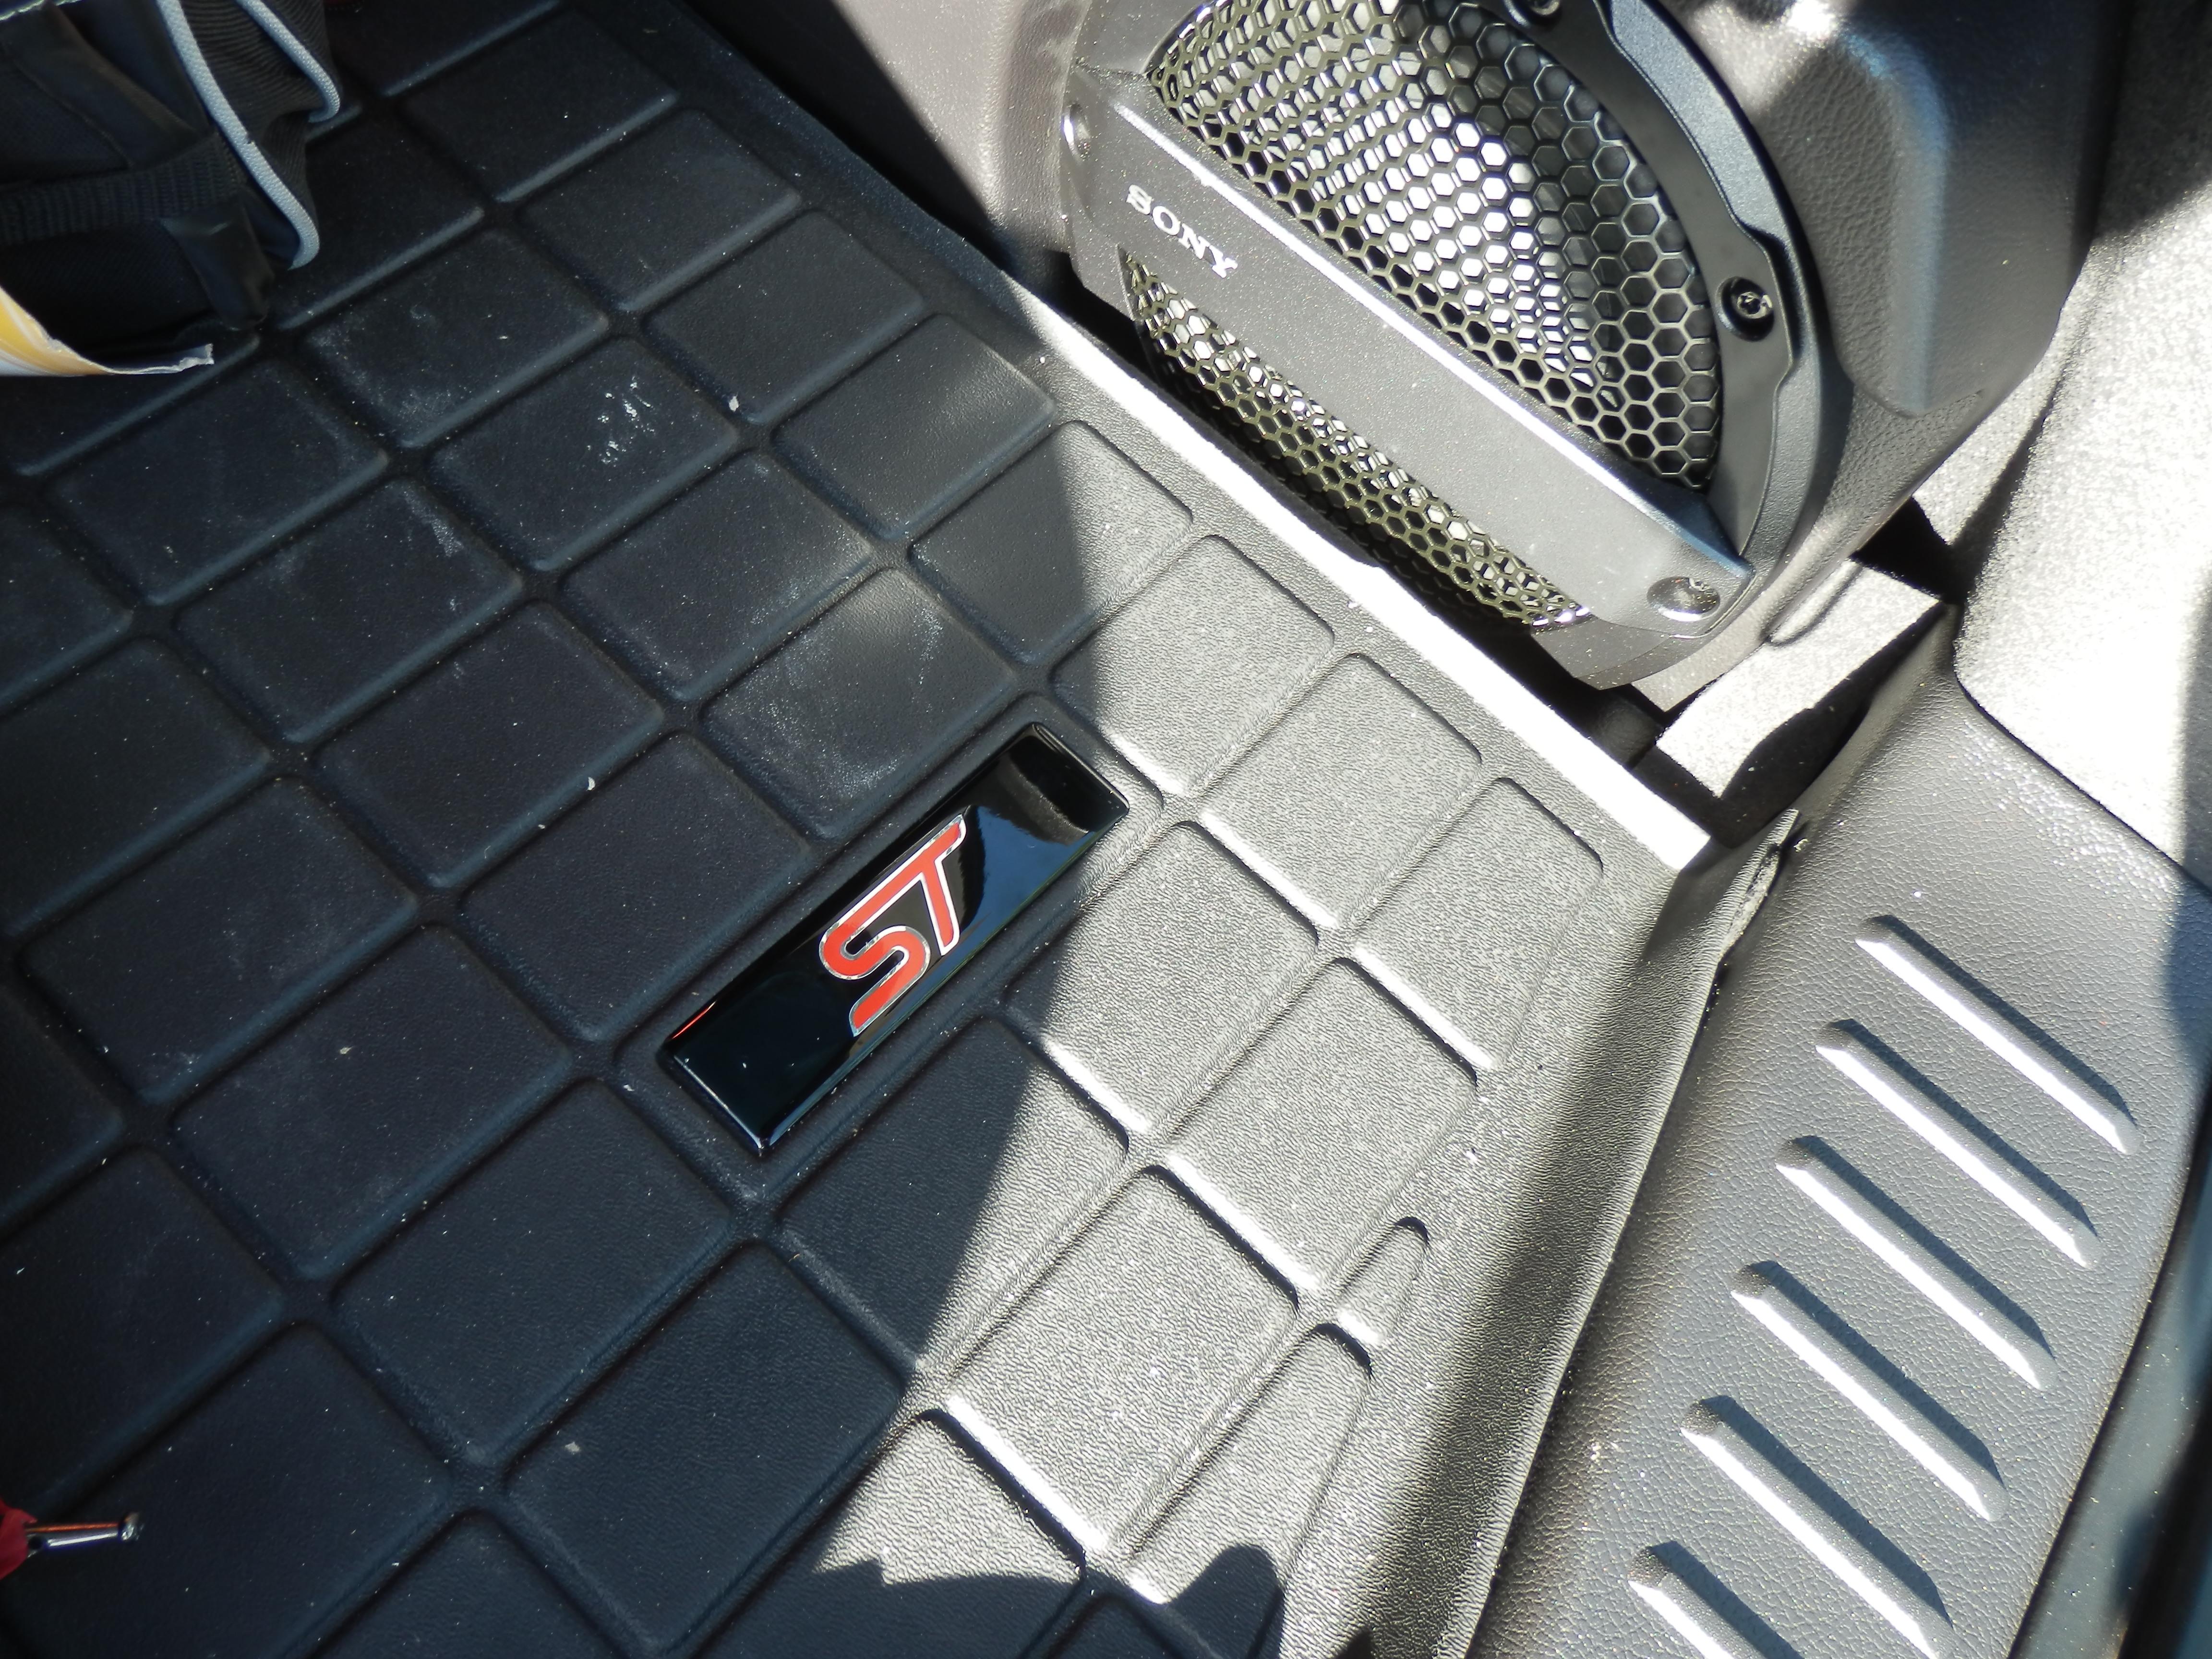 Weathertech mat sticker - Name P6170104 Jpg Views 812 Size 3 51 Mb